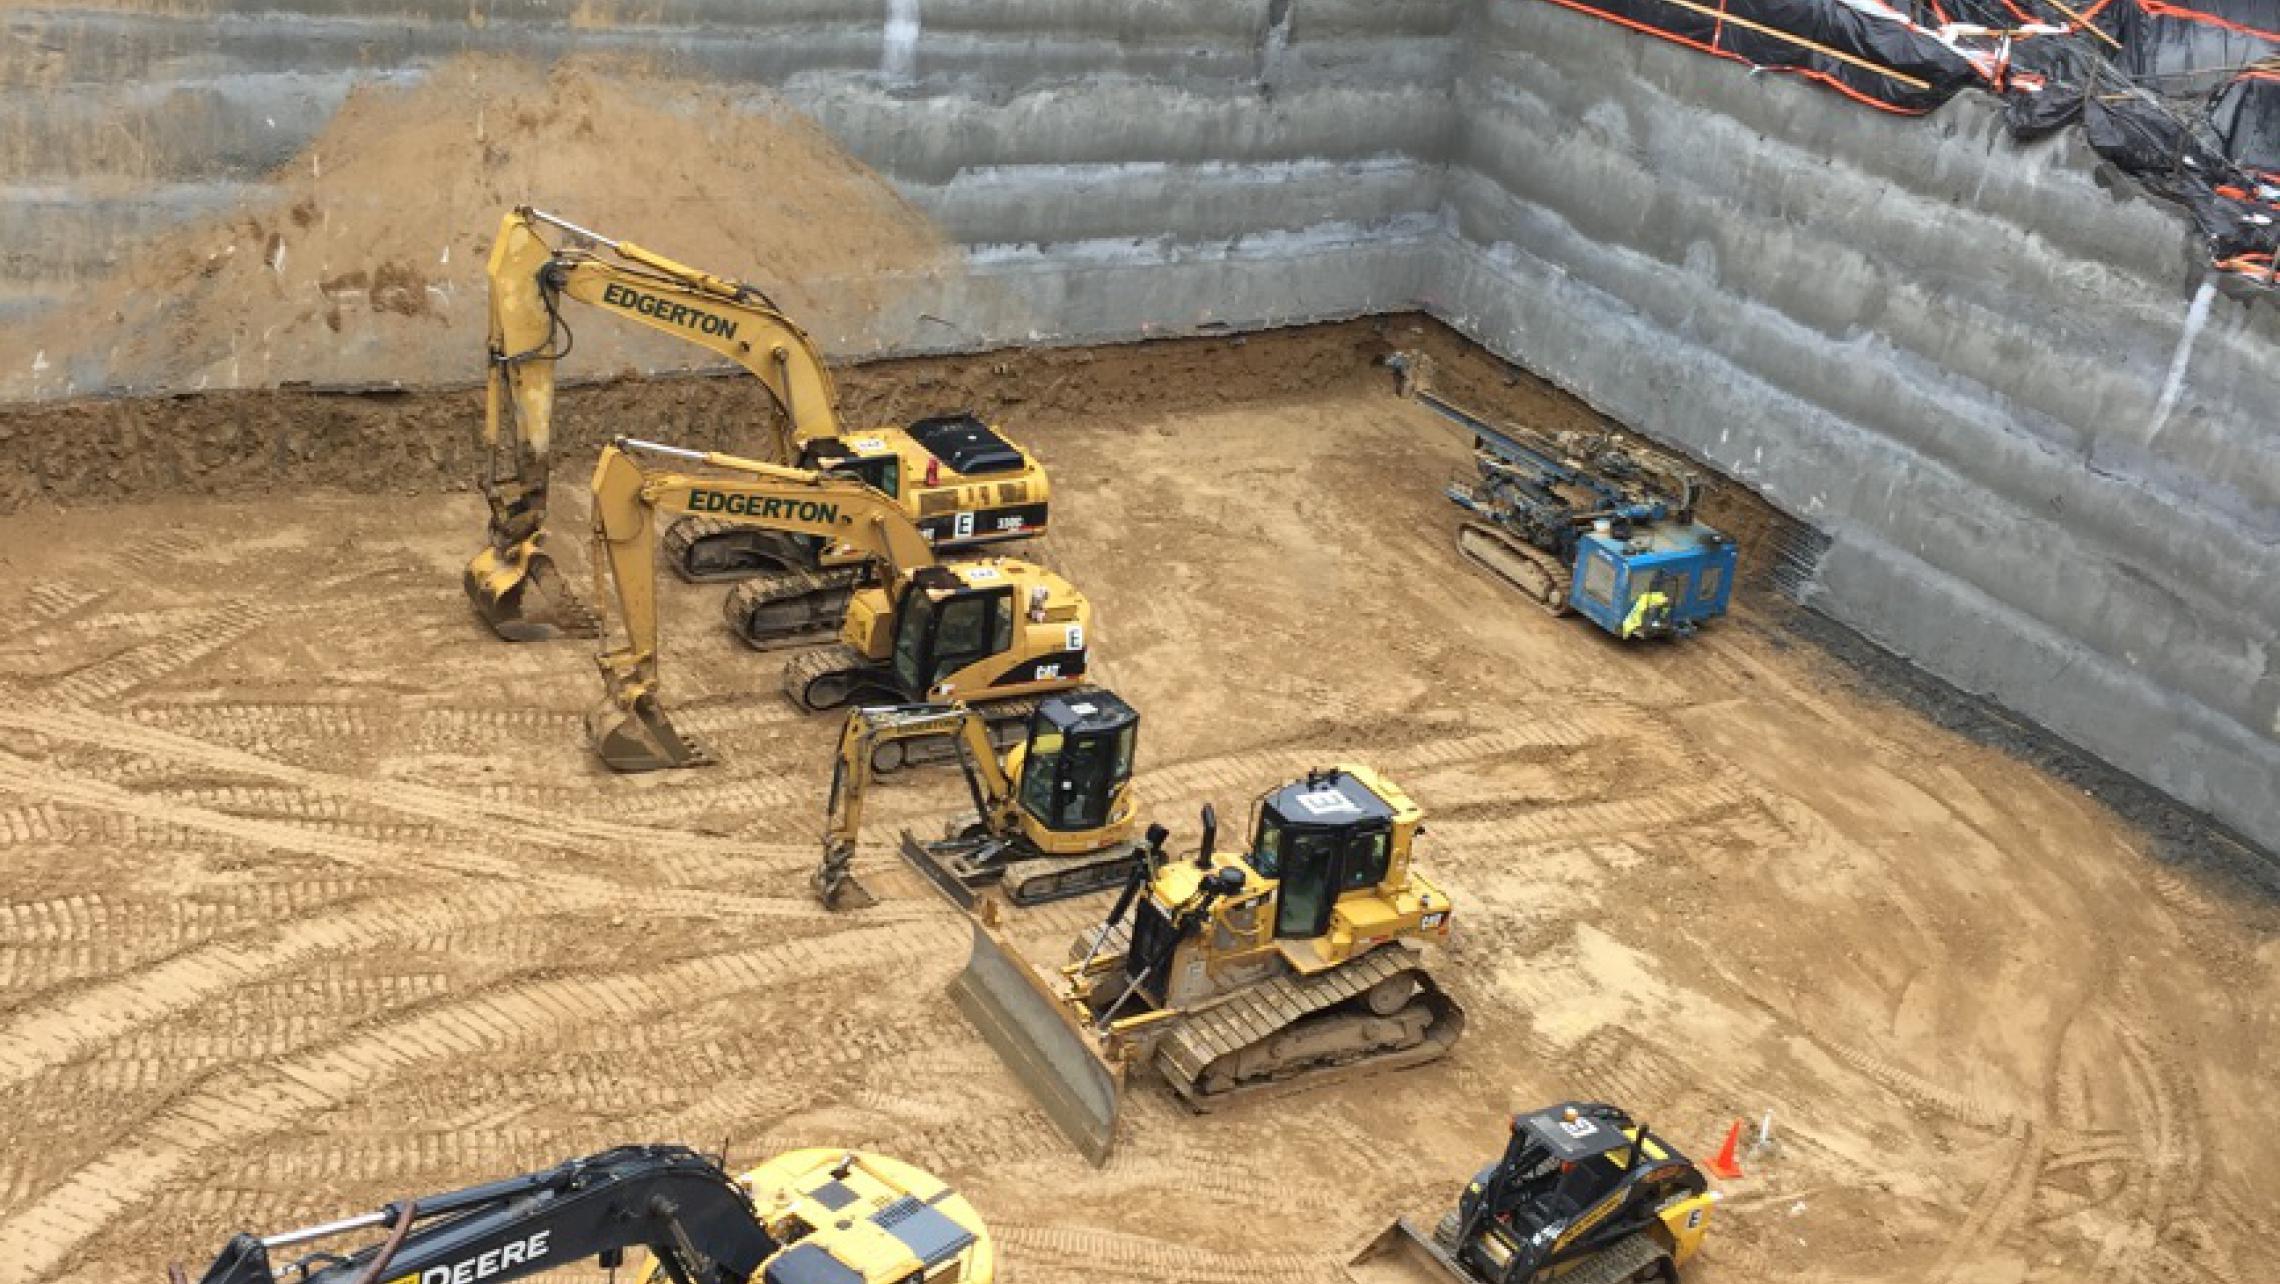 ULI 25 West Main Construction Equipment in Future Parking Ramp